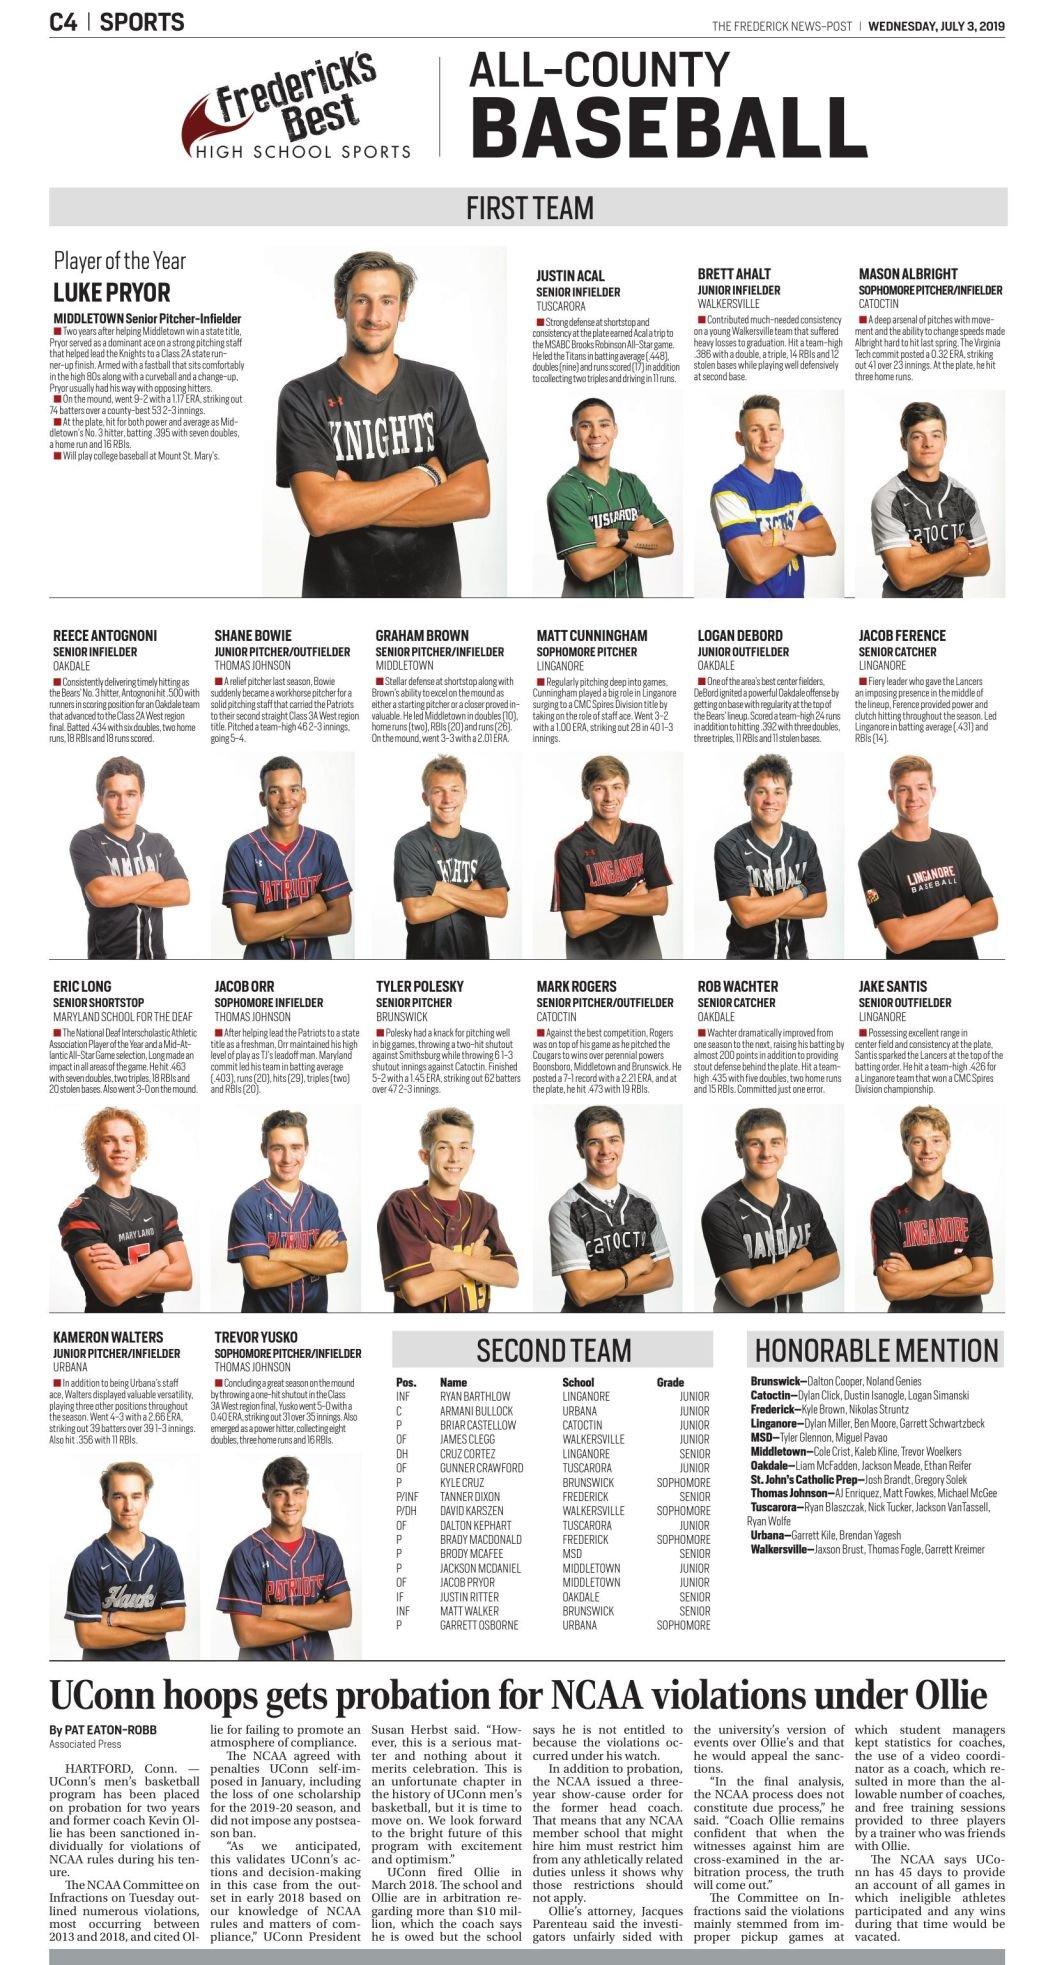 2019 All-County Baseball Team